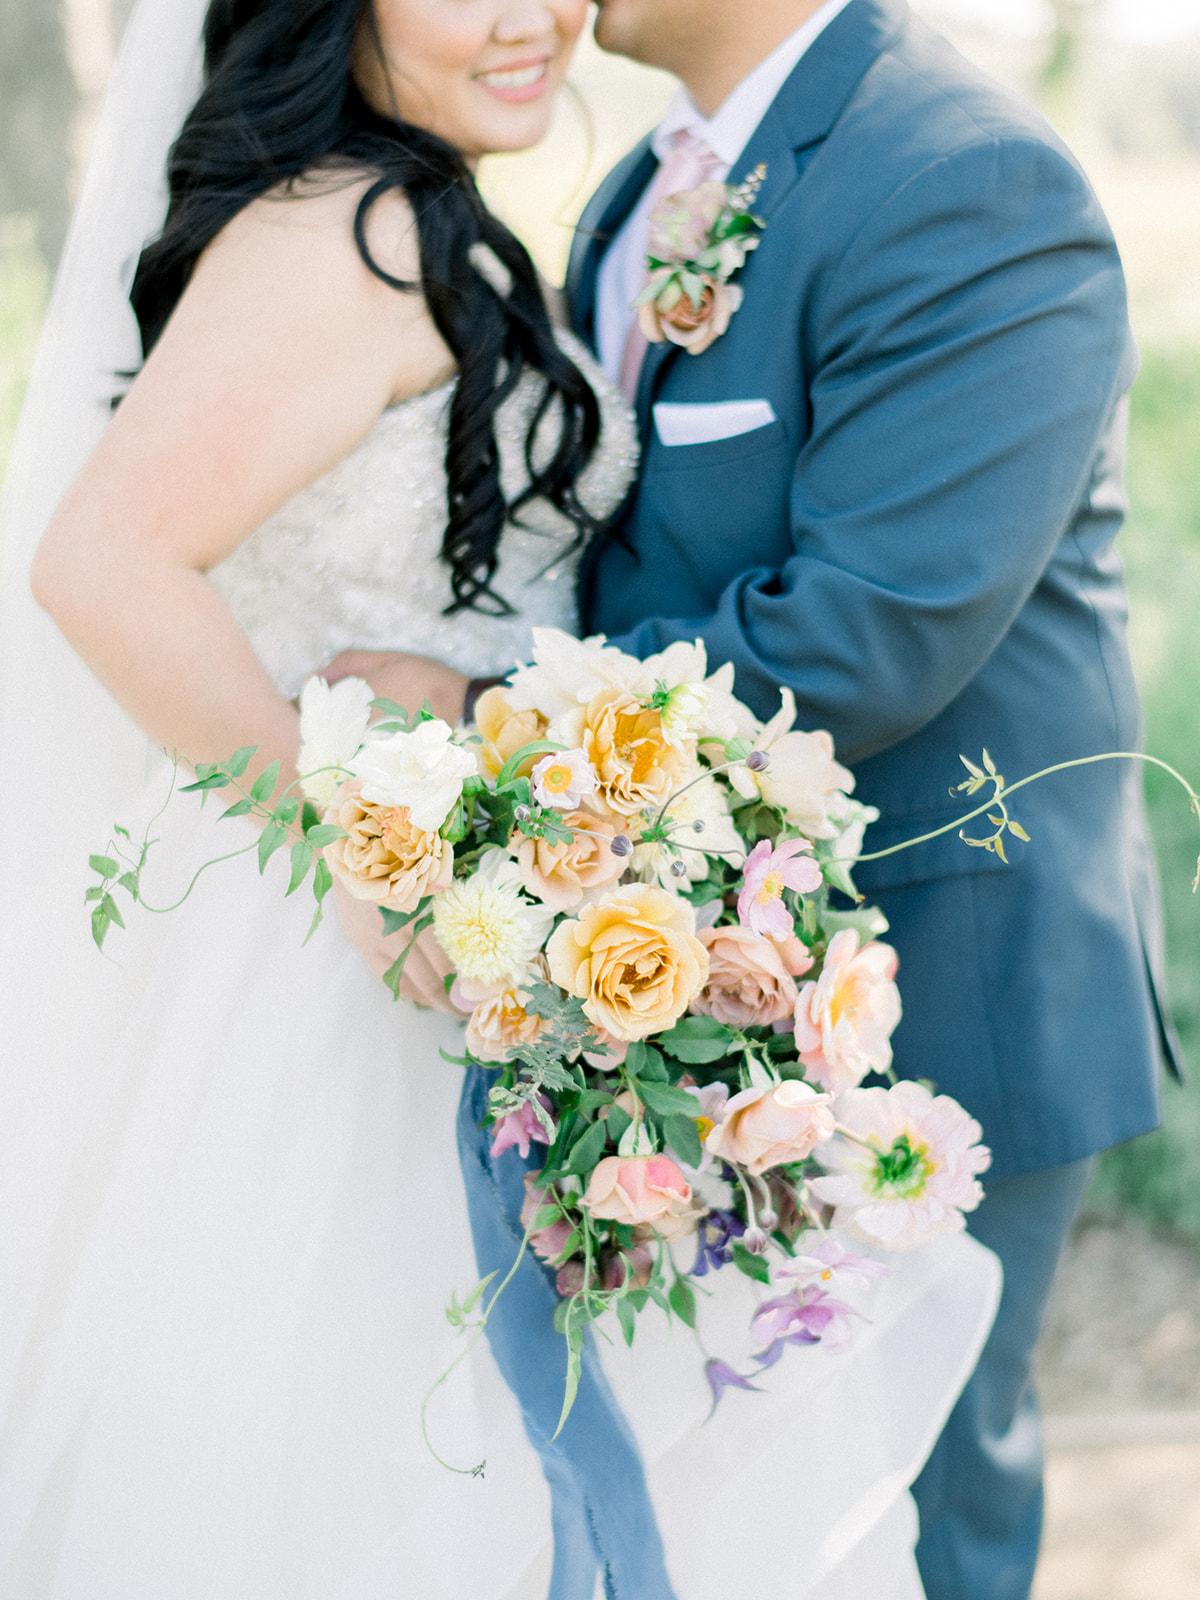 jessicaanderick-wedding-683.jpg